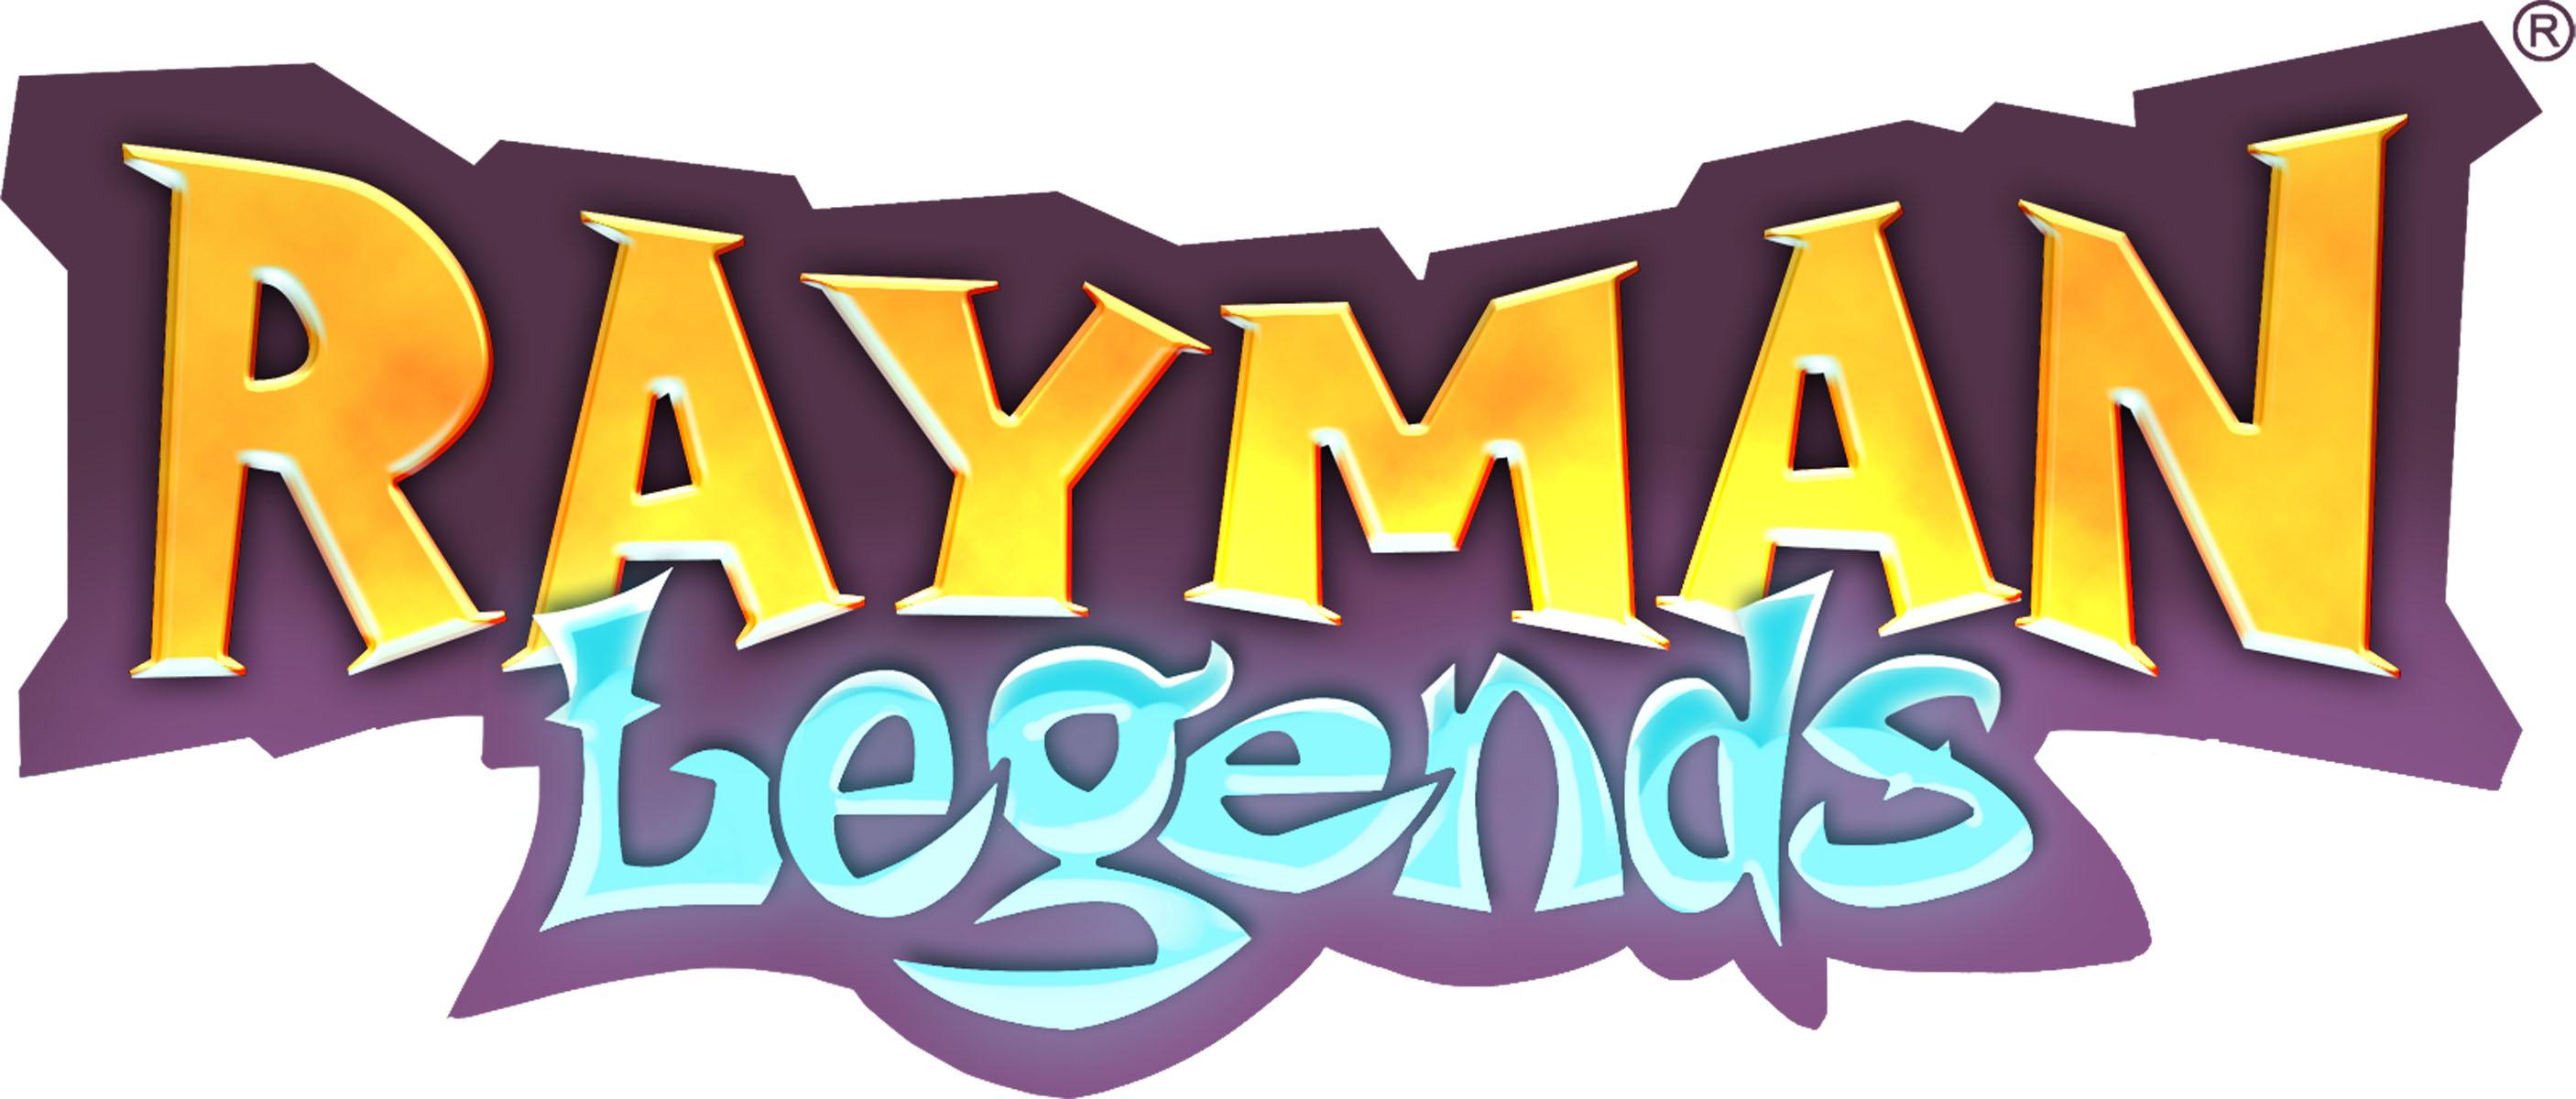 120604_4pm_Rayman_Legends_LOGO